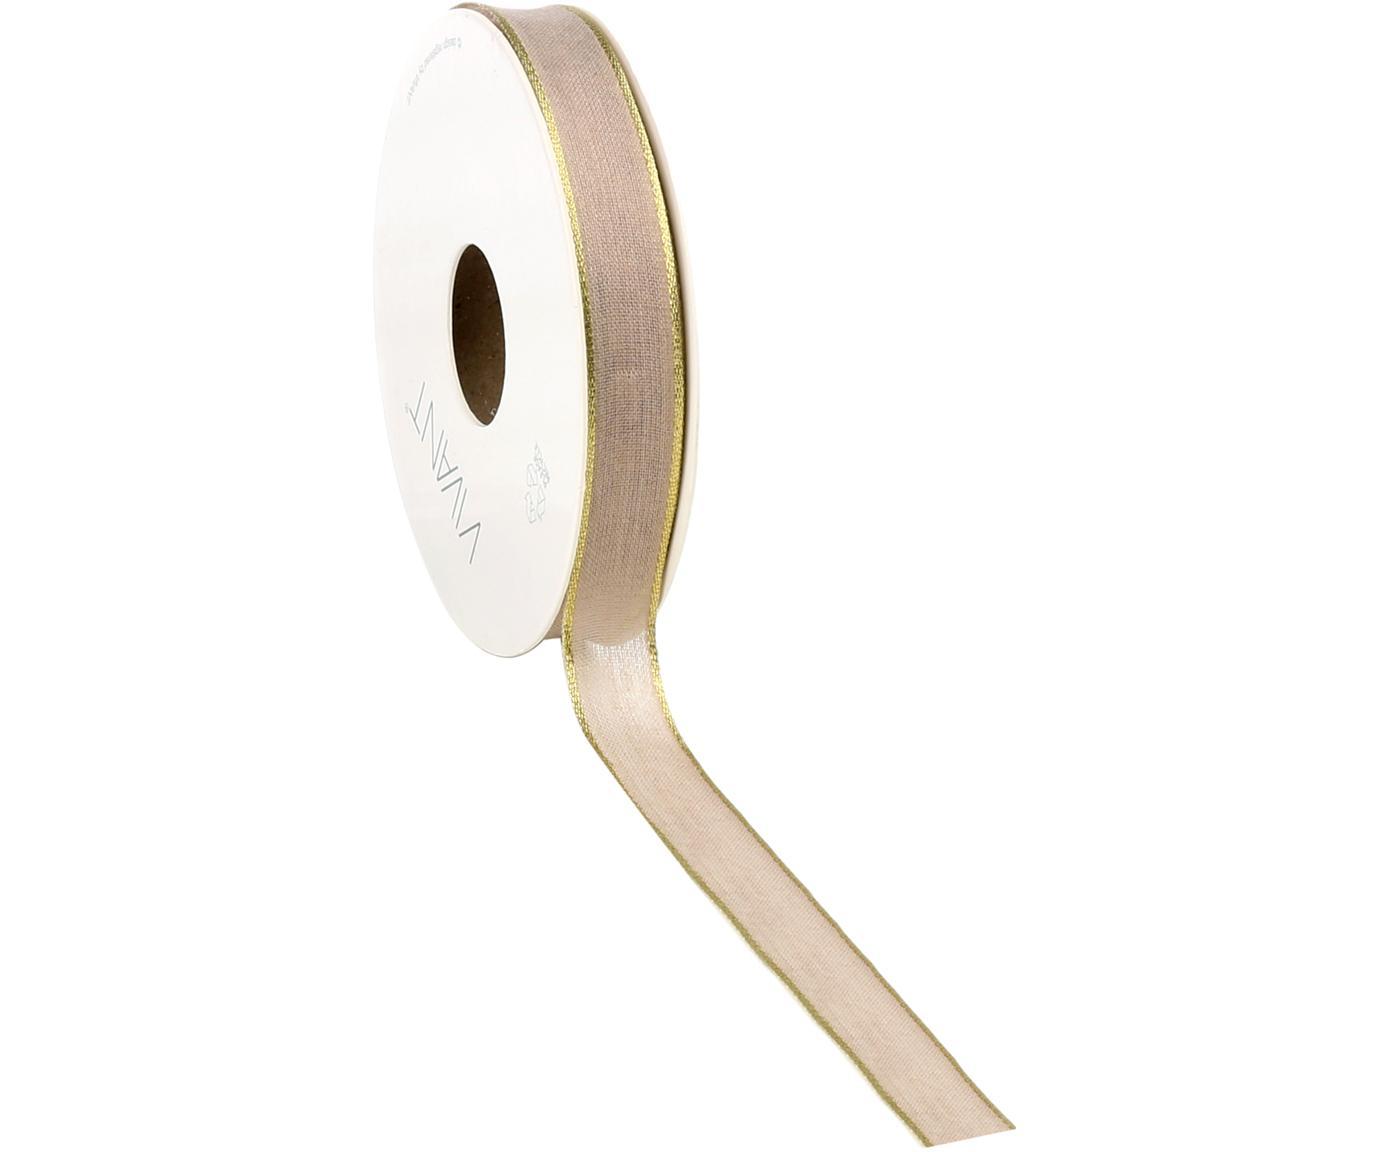 Cadeaulint Batiste, 55% rayon, 45% polyester, Taupe, goudkleurig, 3 x 1500 cm